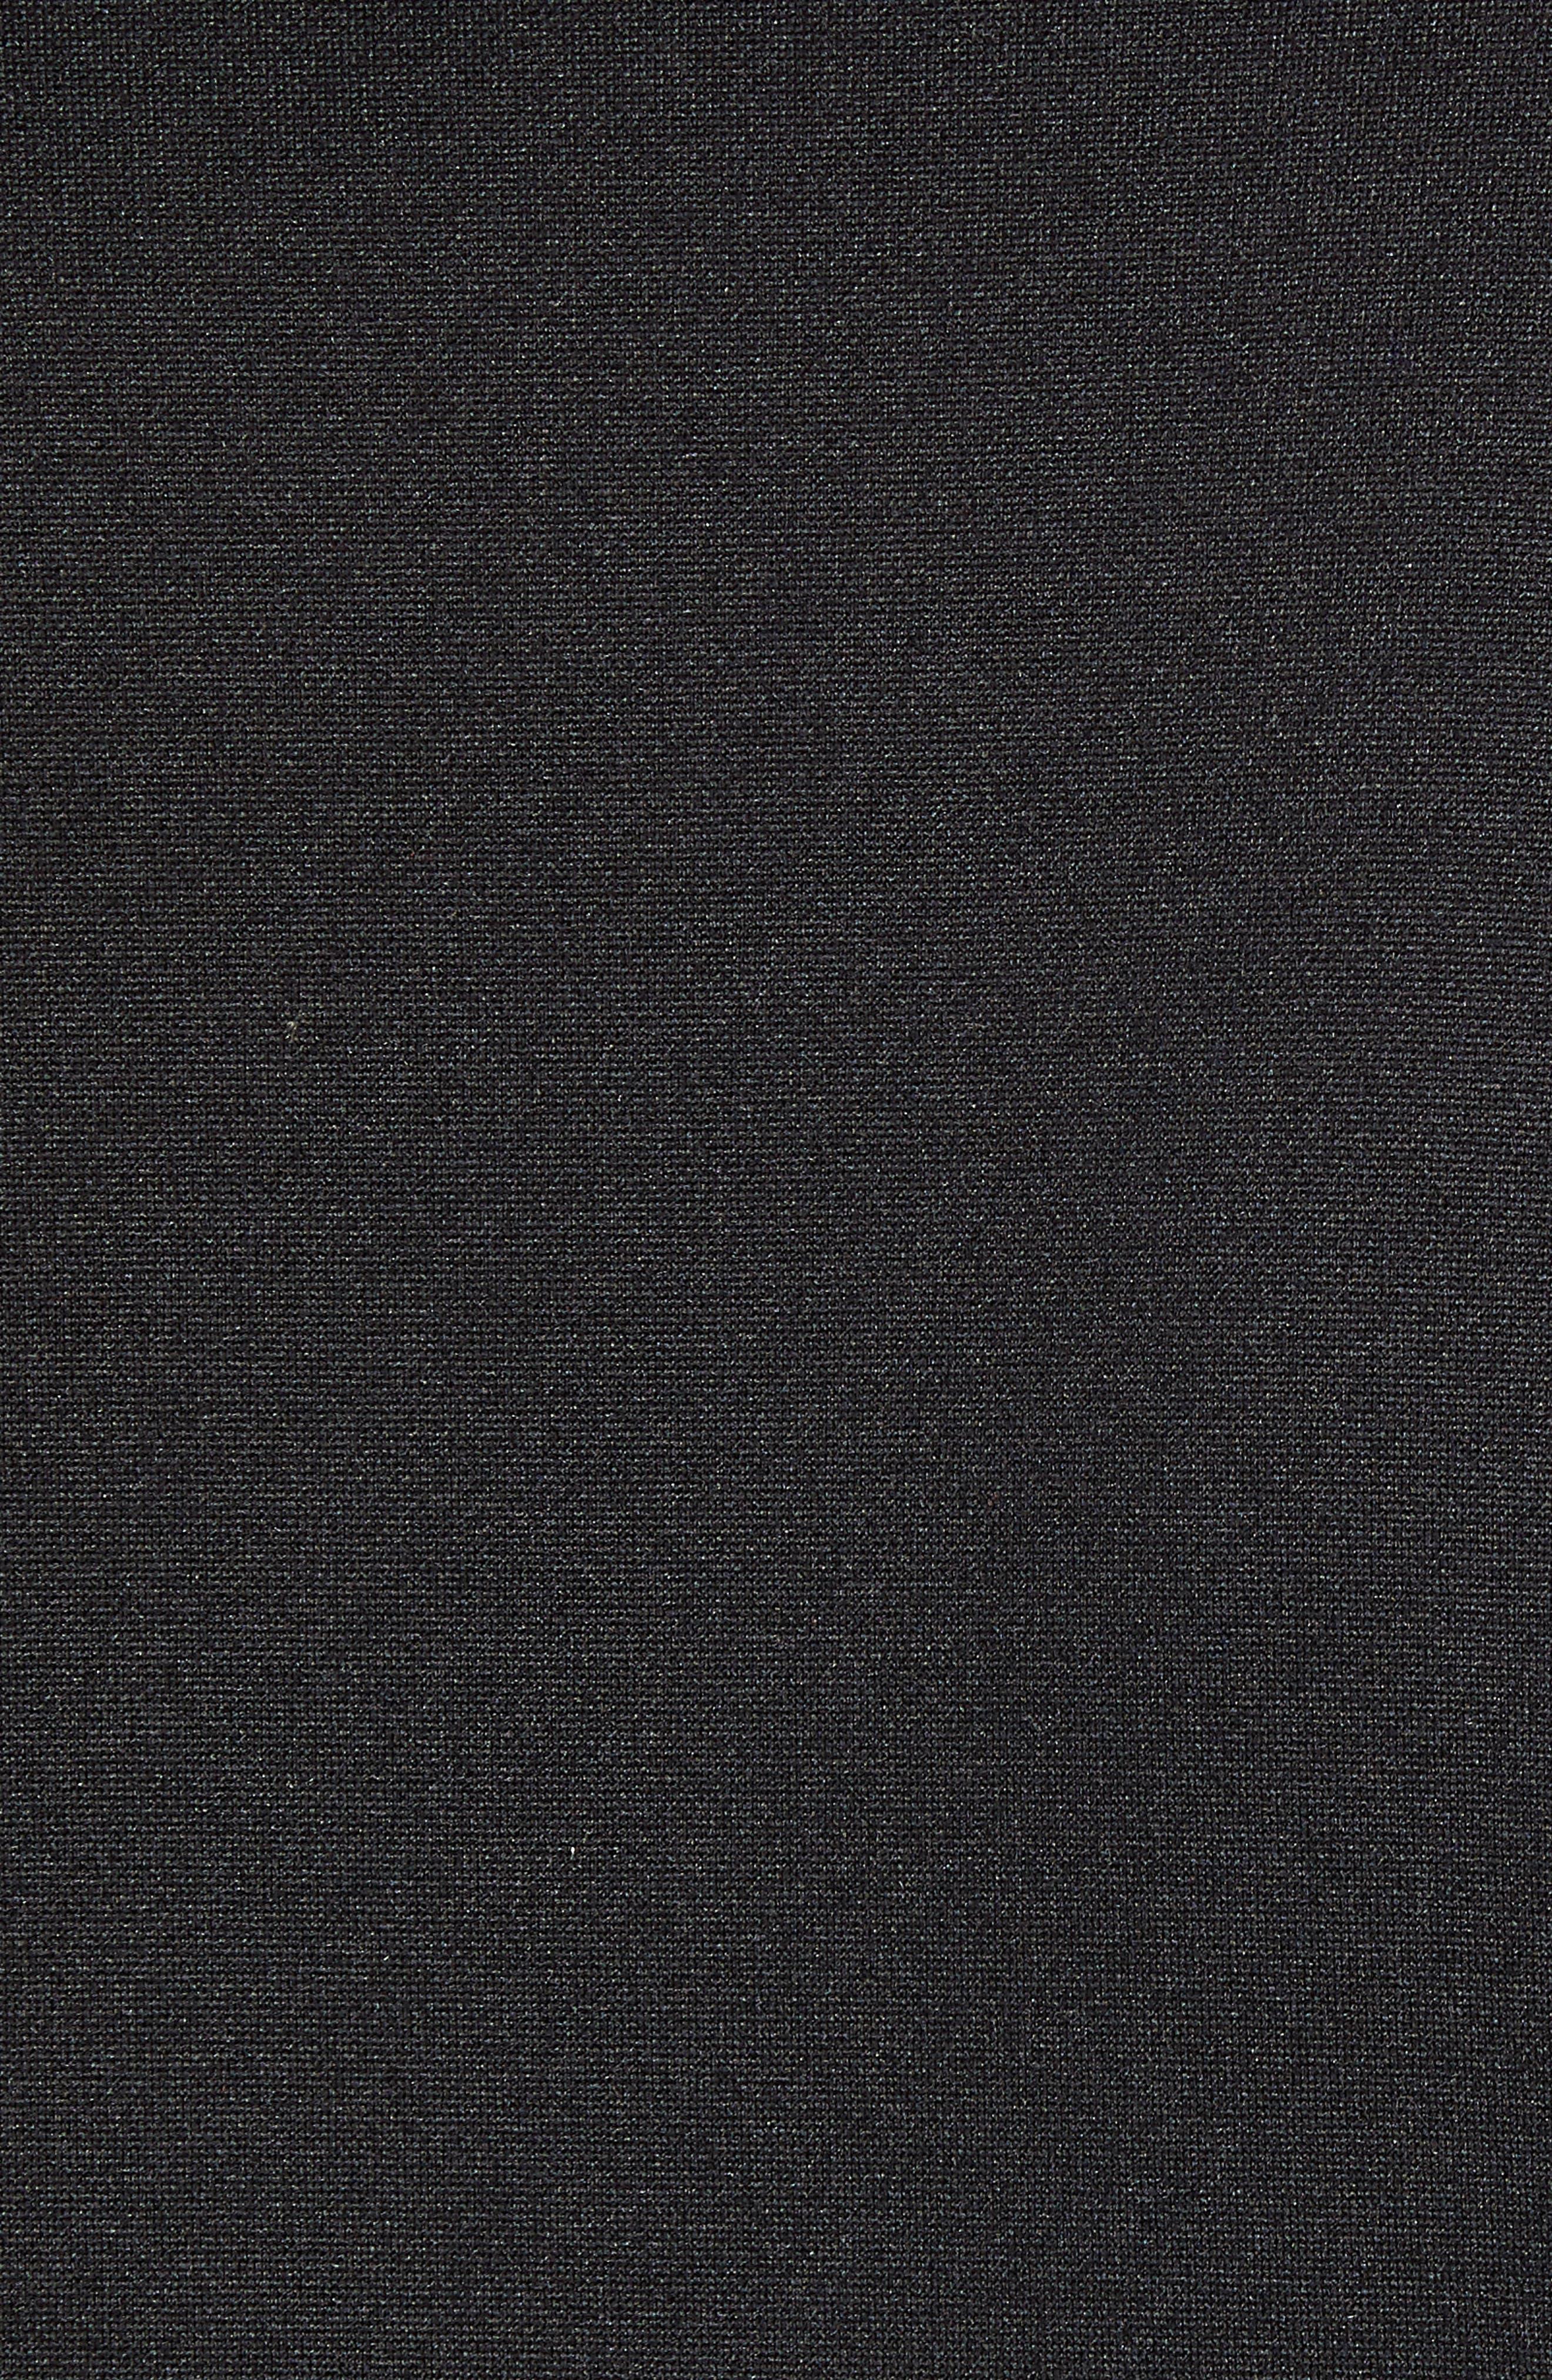 THE NORTH FACE,                             Canyonlands Zip Jacket,                             Alternate thumbnail 5, color,                             TNF BLACK